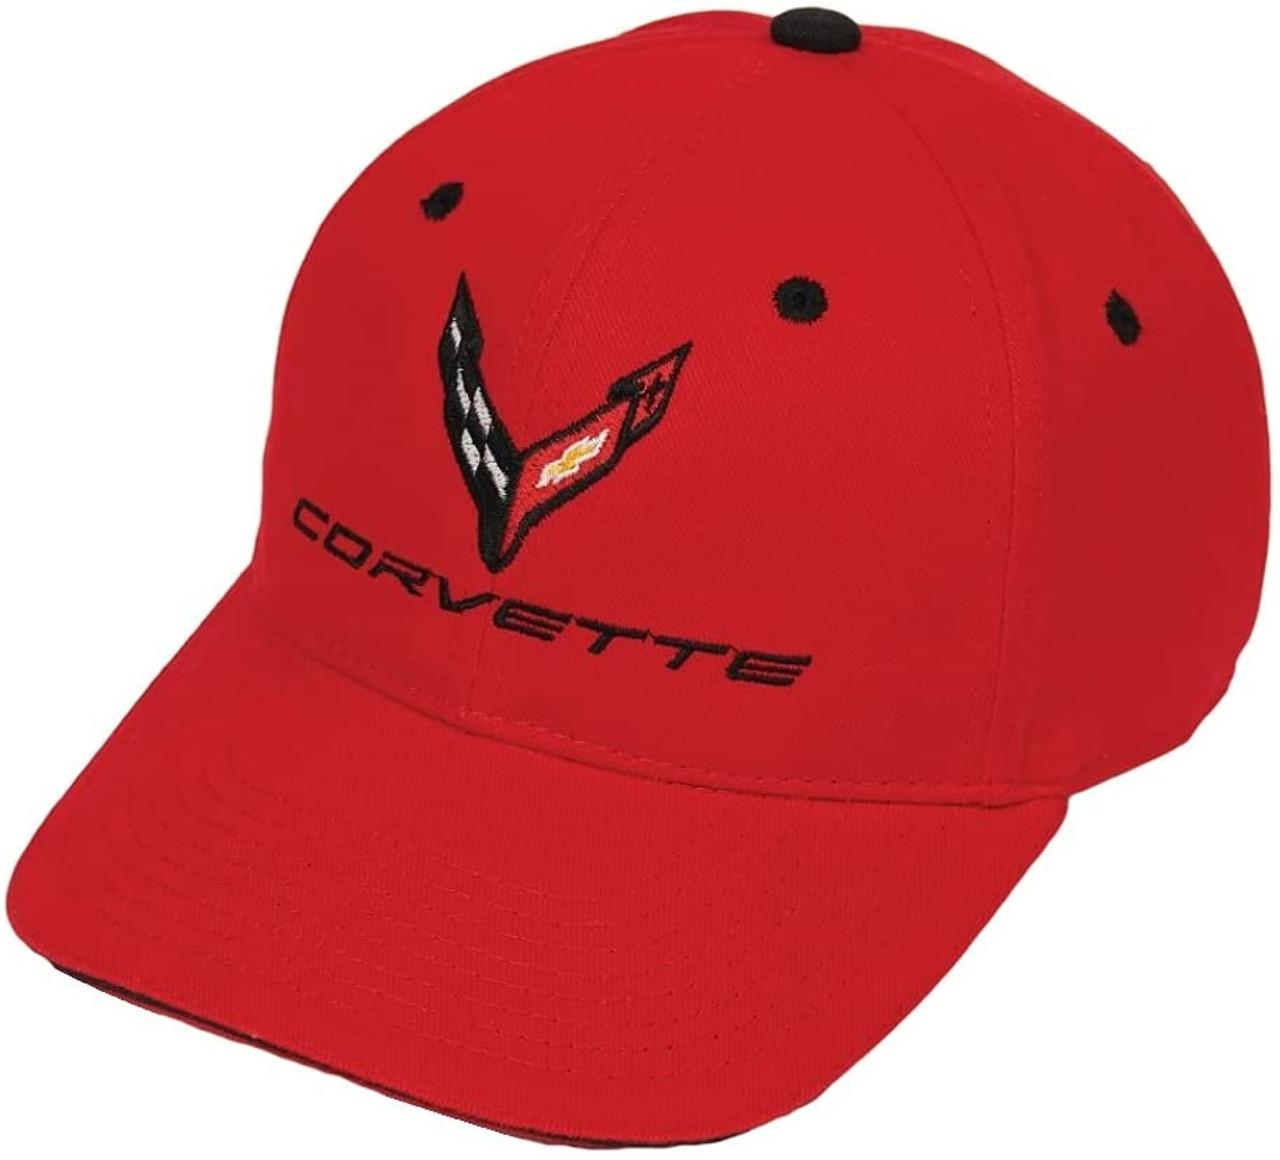 C8 Corvette Structured Contrast Red Cotton Hat